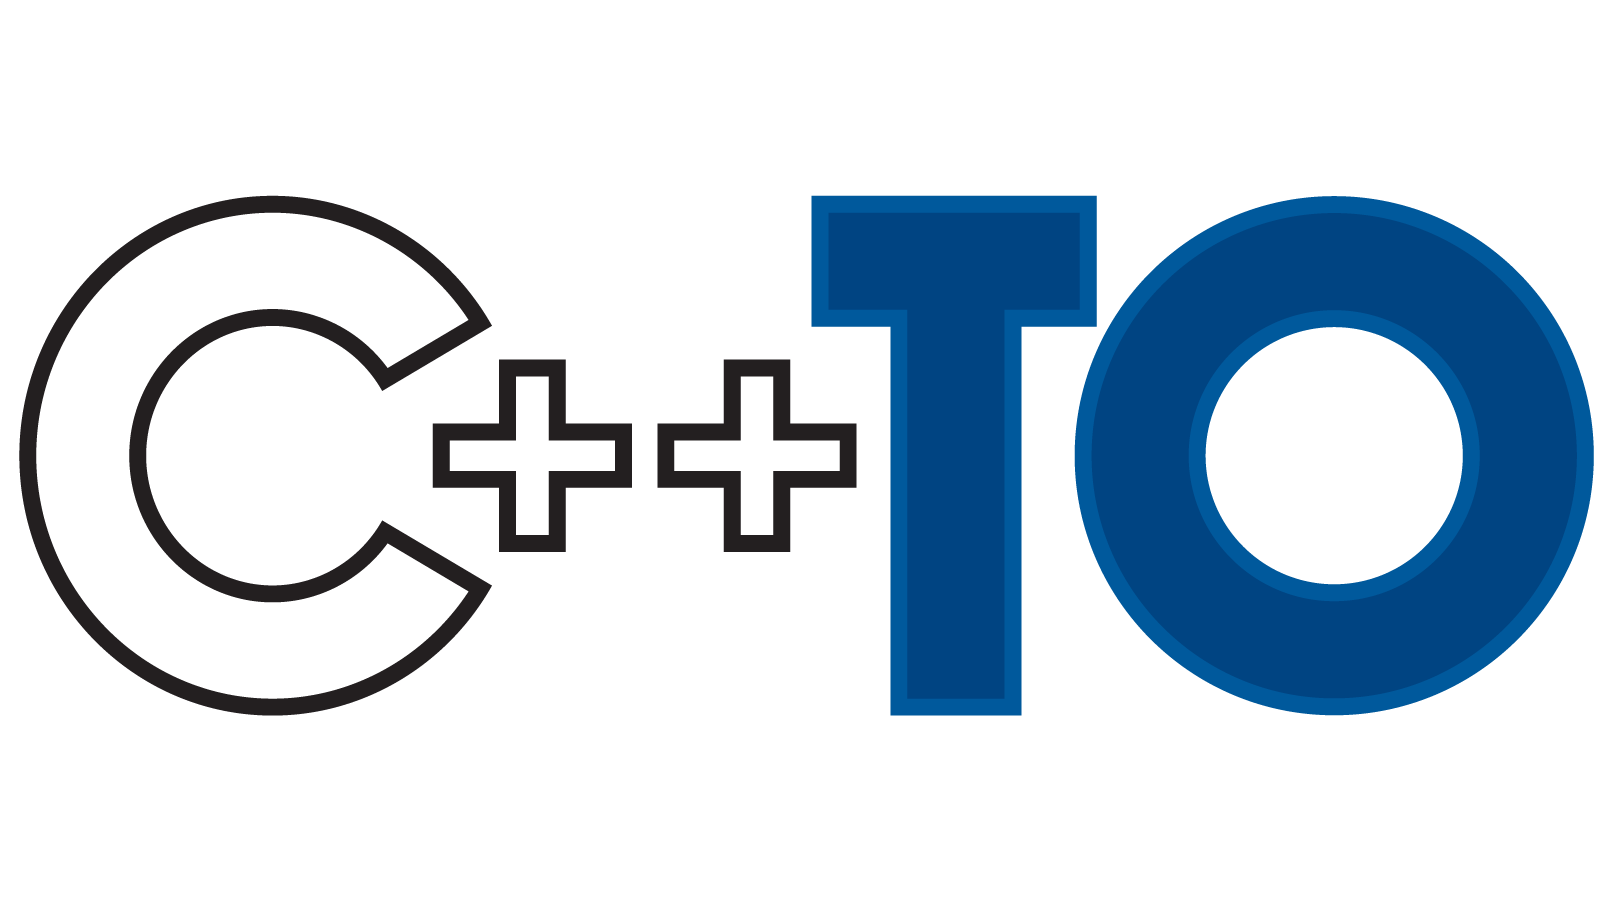 C++TO The Toronto C++ User Group